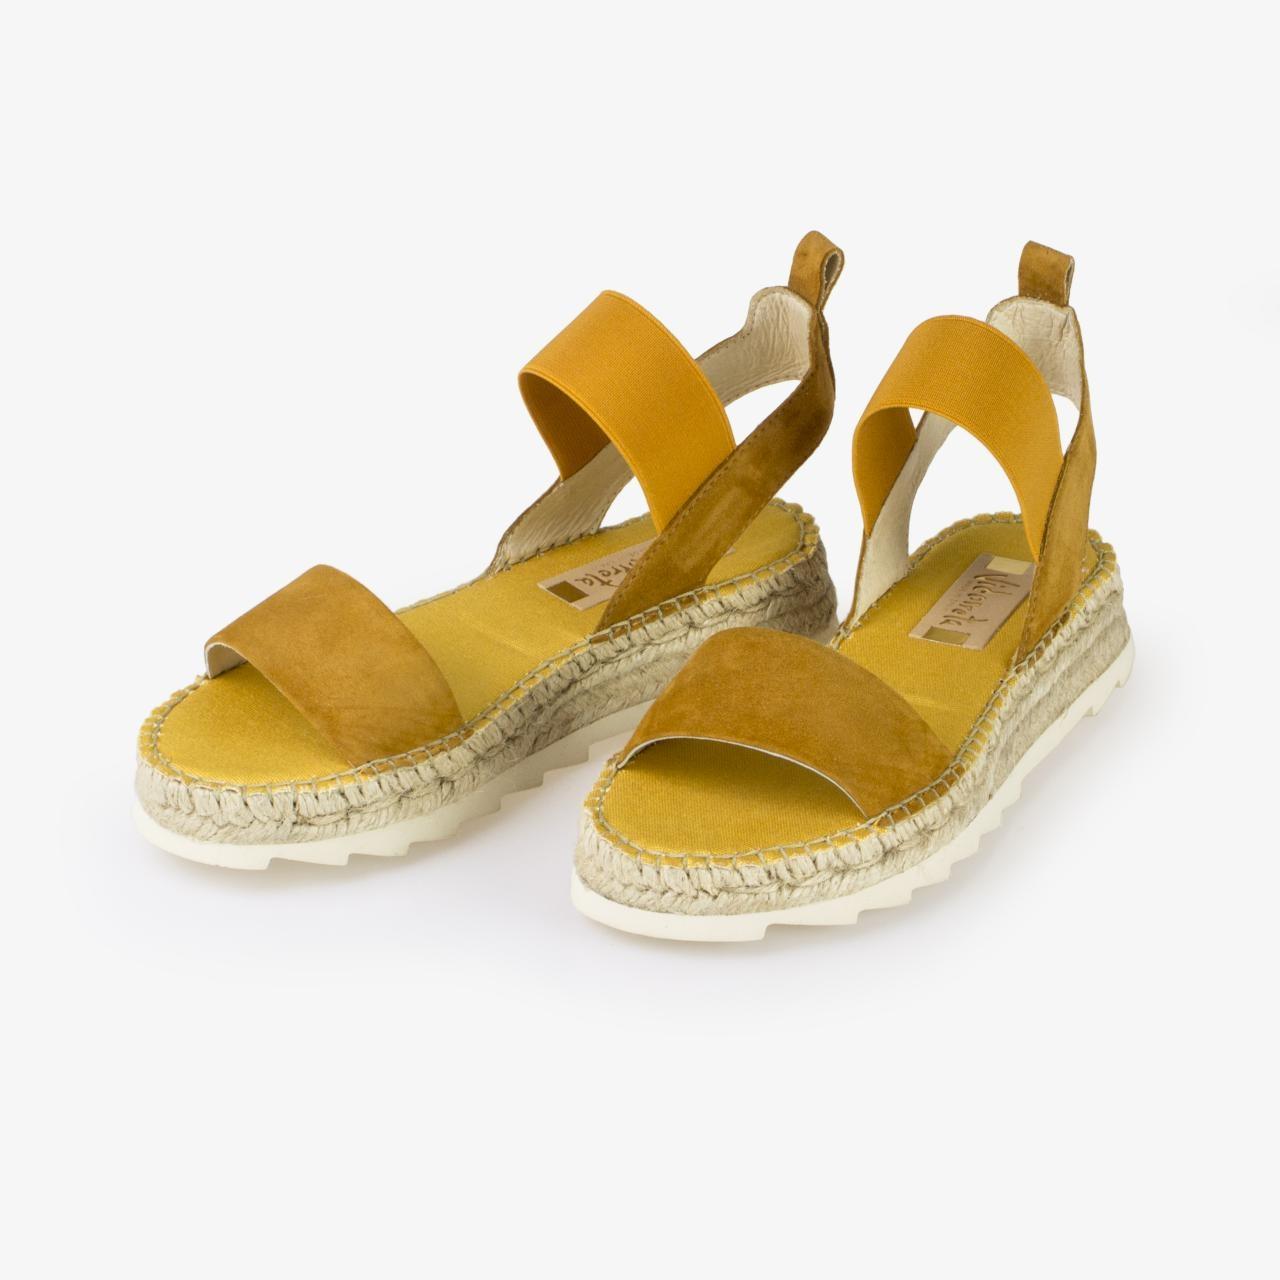 Sandalia Yute Piel Amarilla - Ítem1